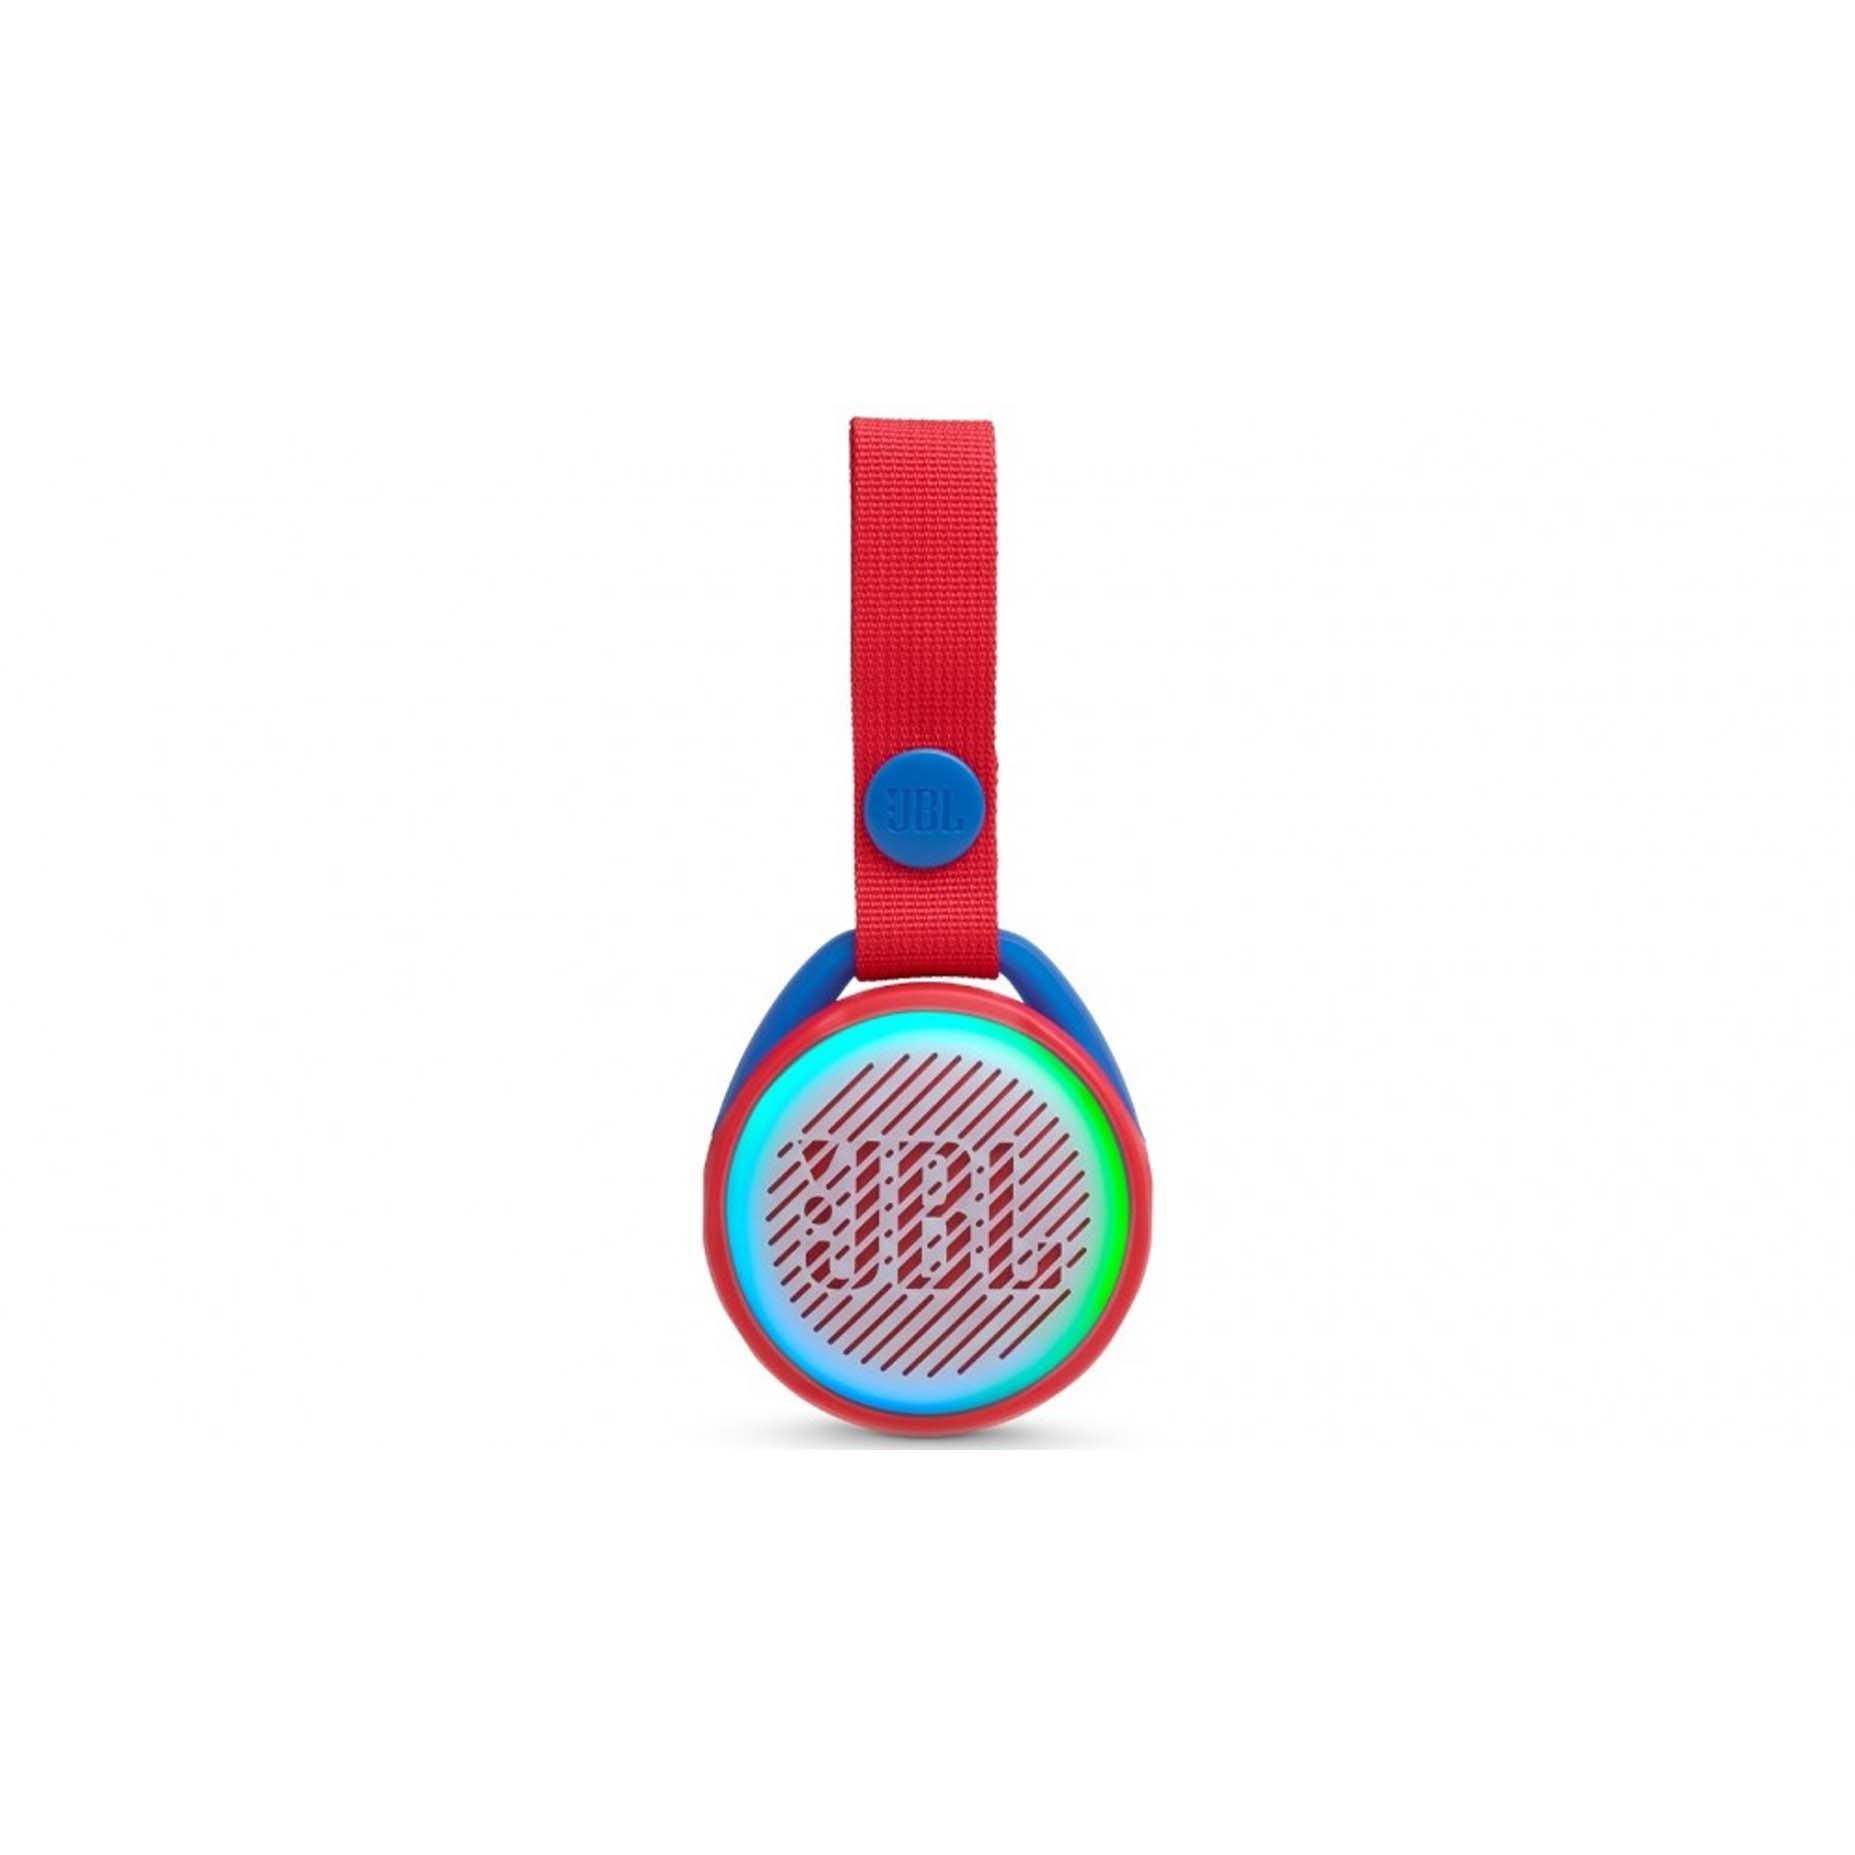 Harga JBL JR POP Kids portable Bluetooth speaker red